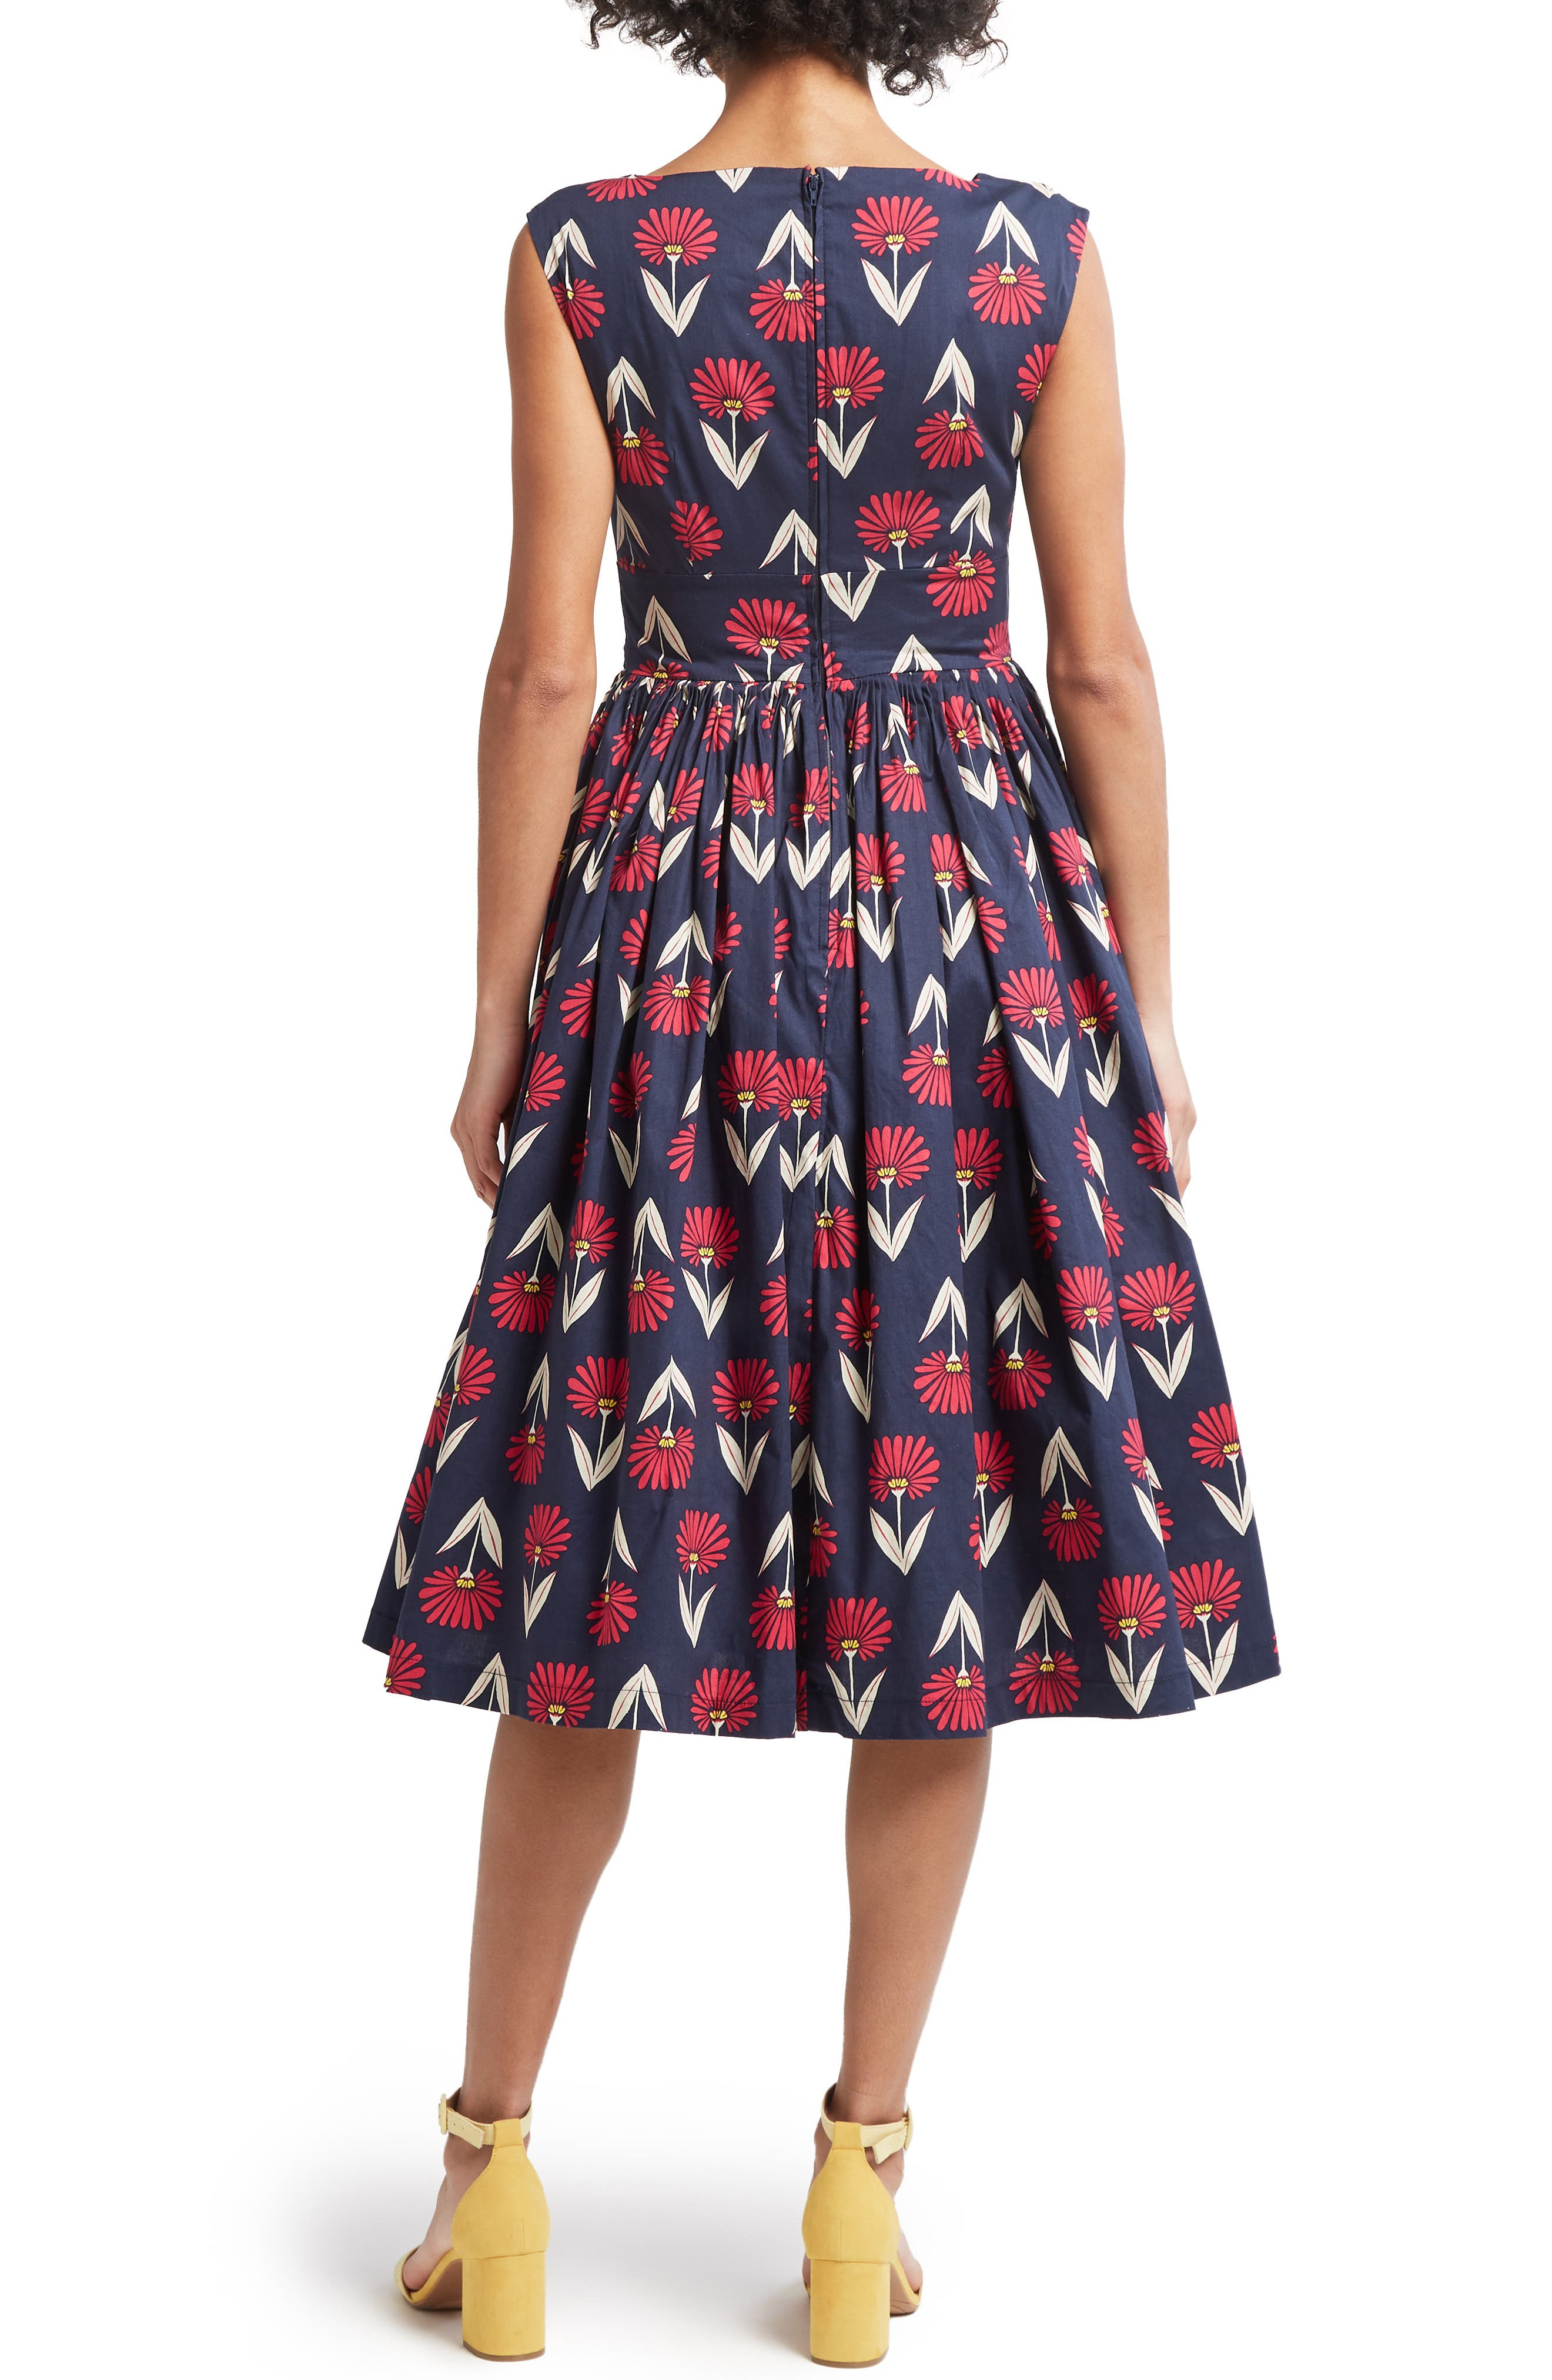 8030fc0e Women's Modcloth Clothing | Nordstrom